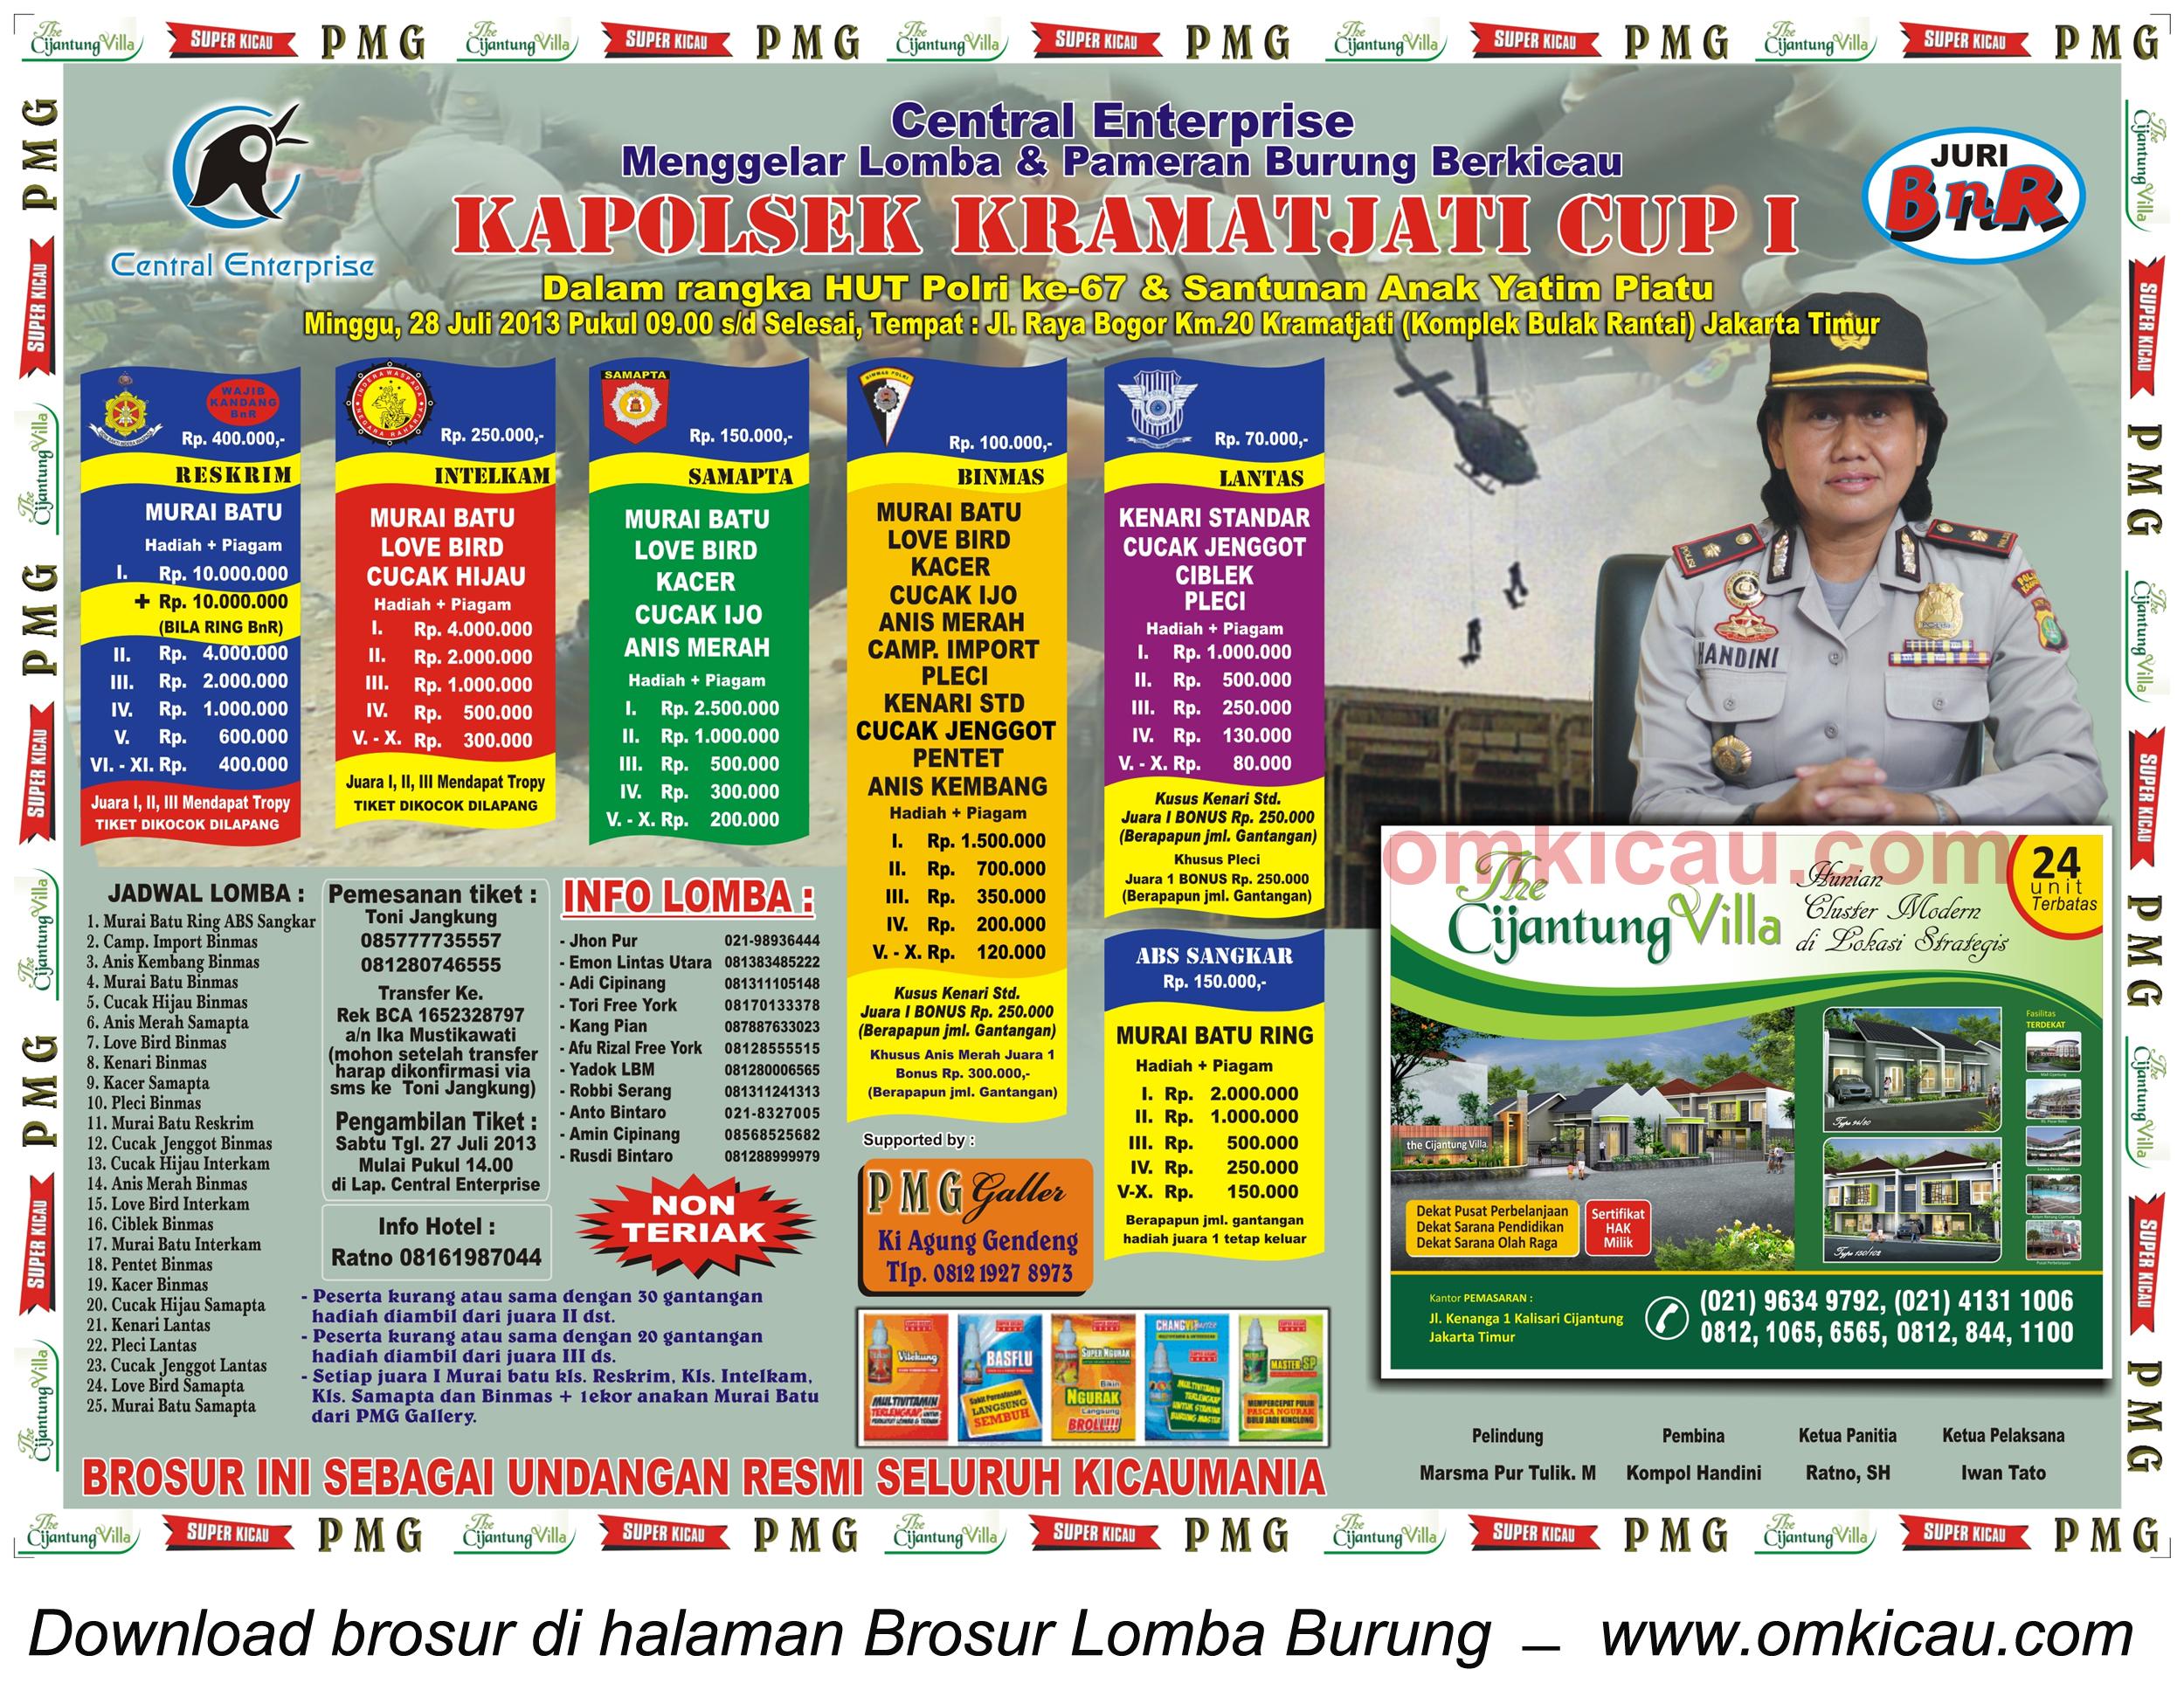 Brosur Lomba Burung Kapolsek Kramatjati Cup I - Jakarta - 28 Juli 2013